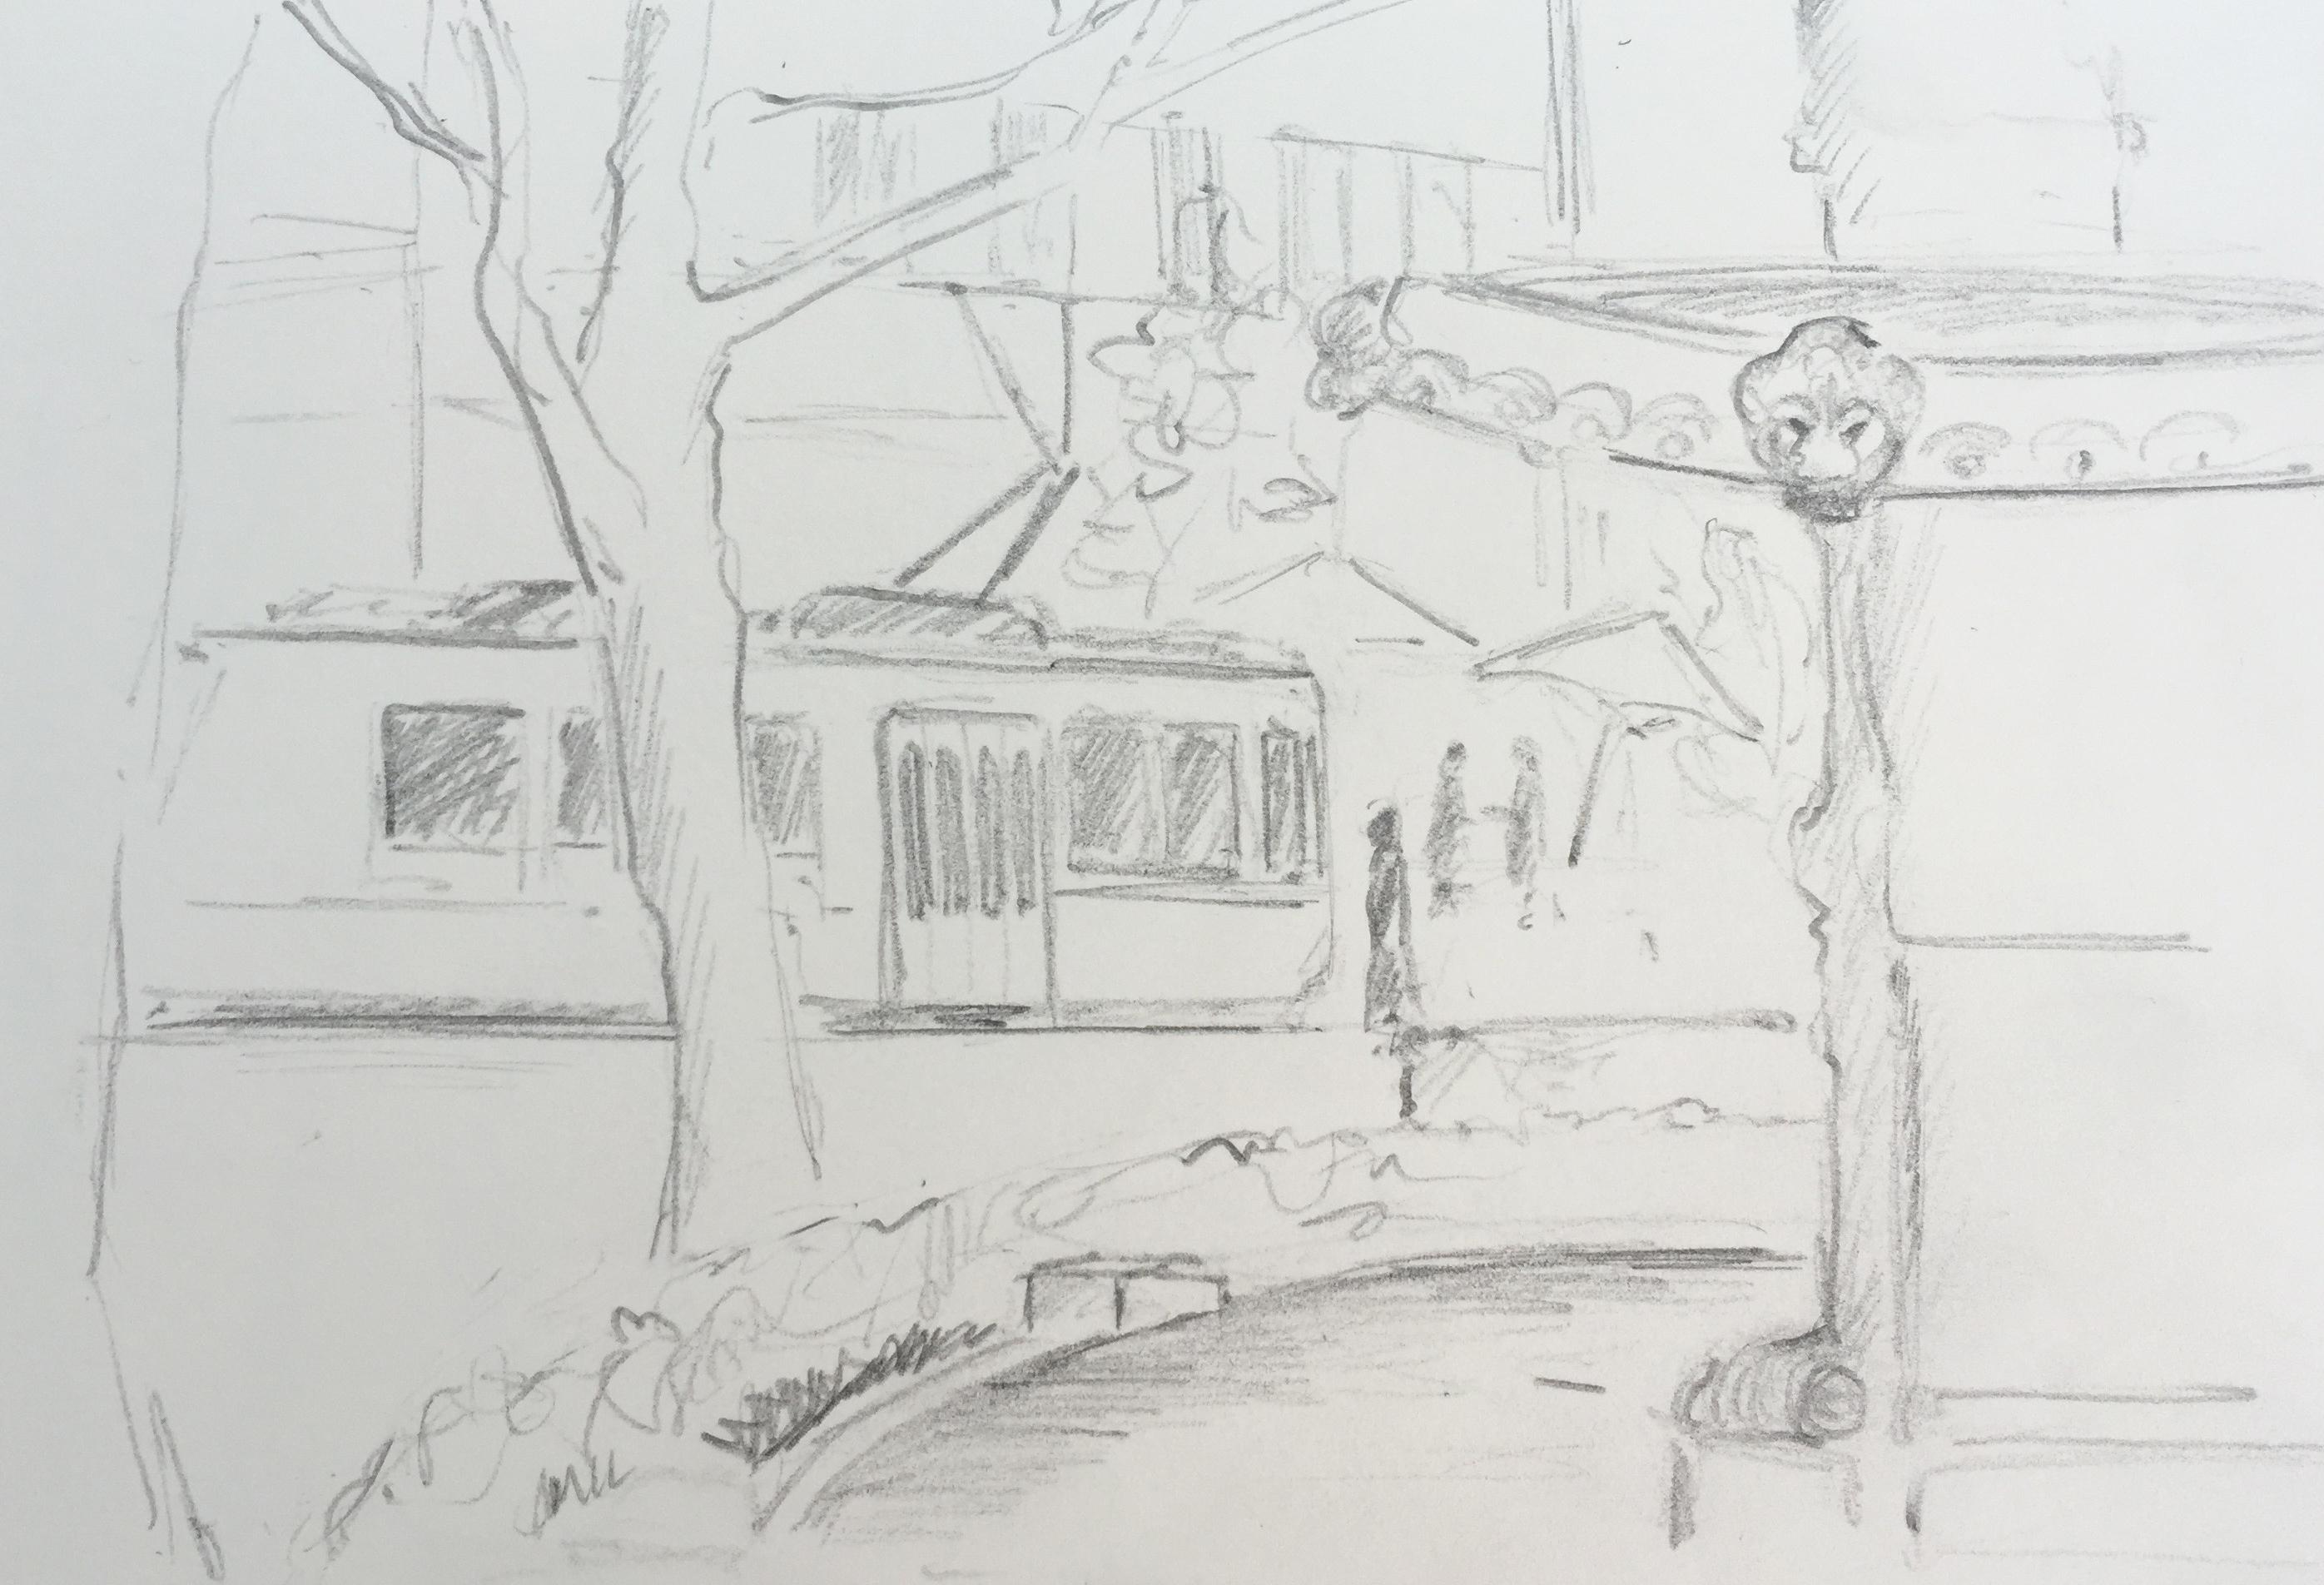 Stadelhofen, Astrid Amadeo, Urban Sketching, Blogg,